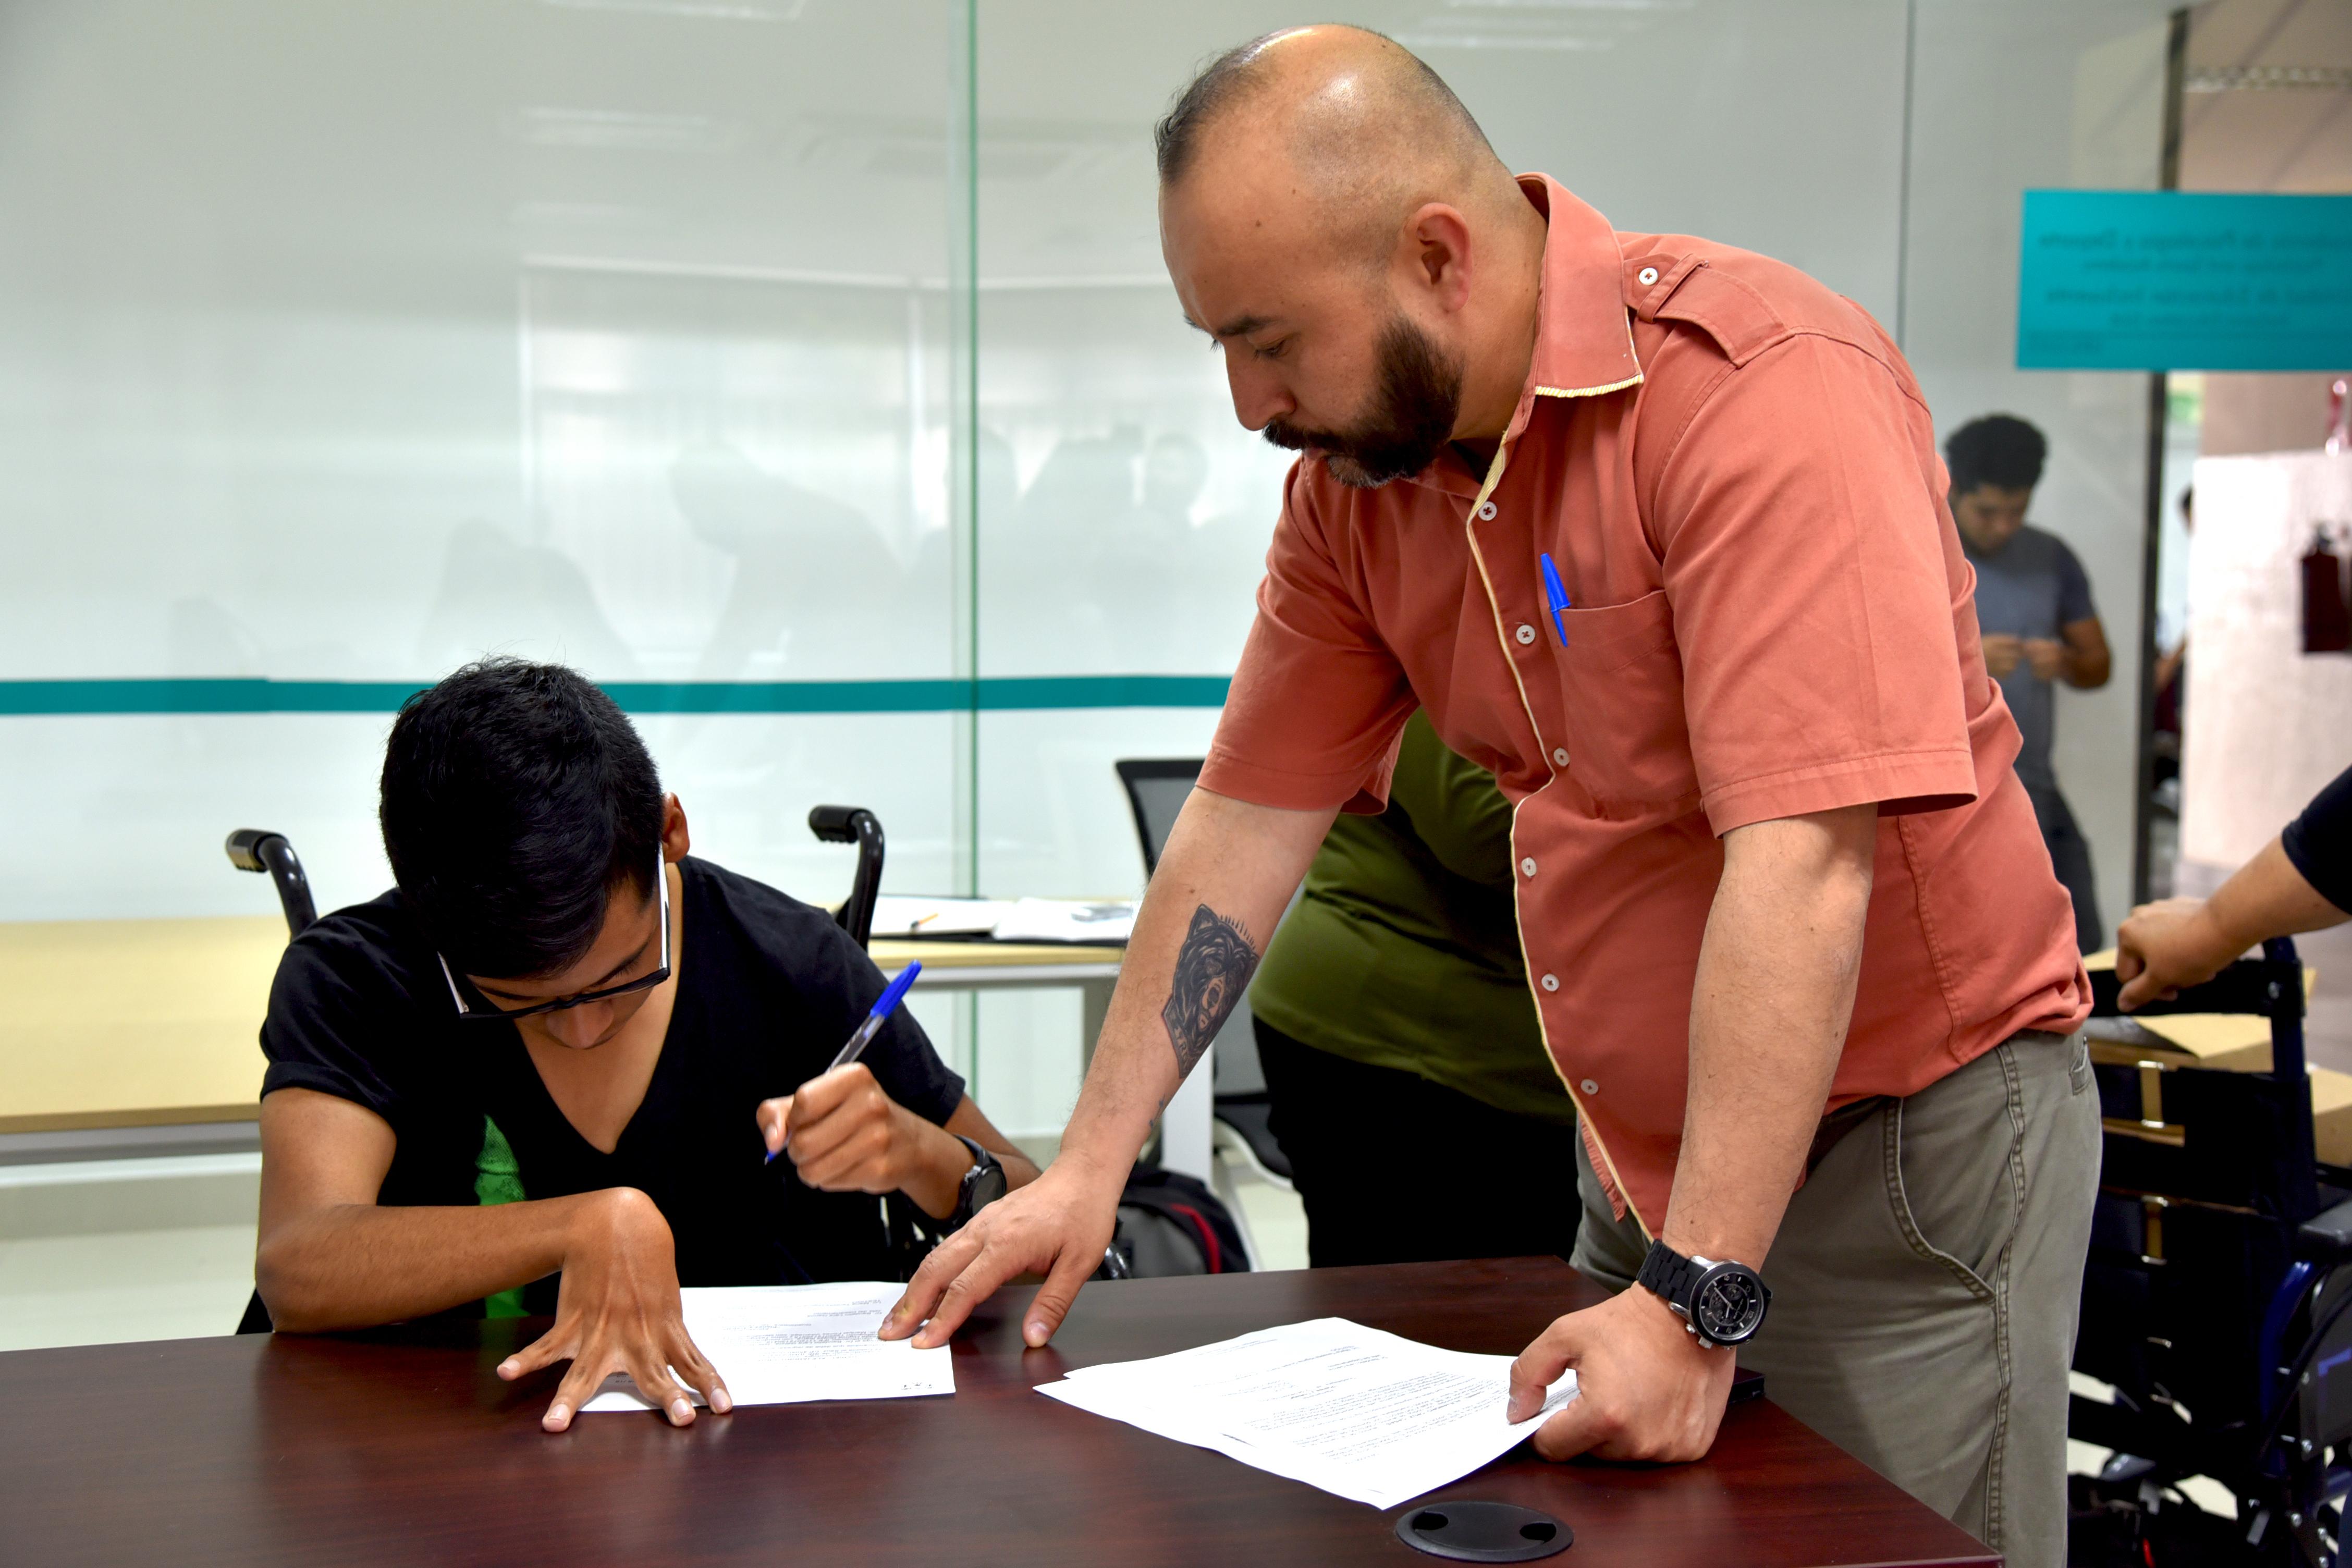 Daniel Cruz Alumno beneficiado firmando documentos